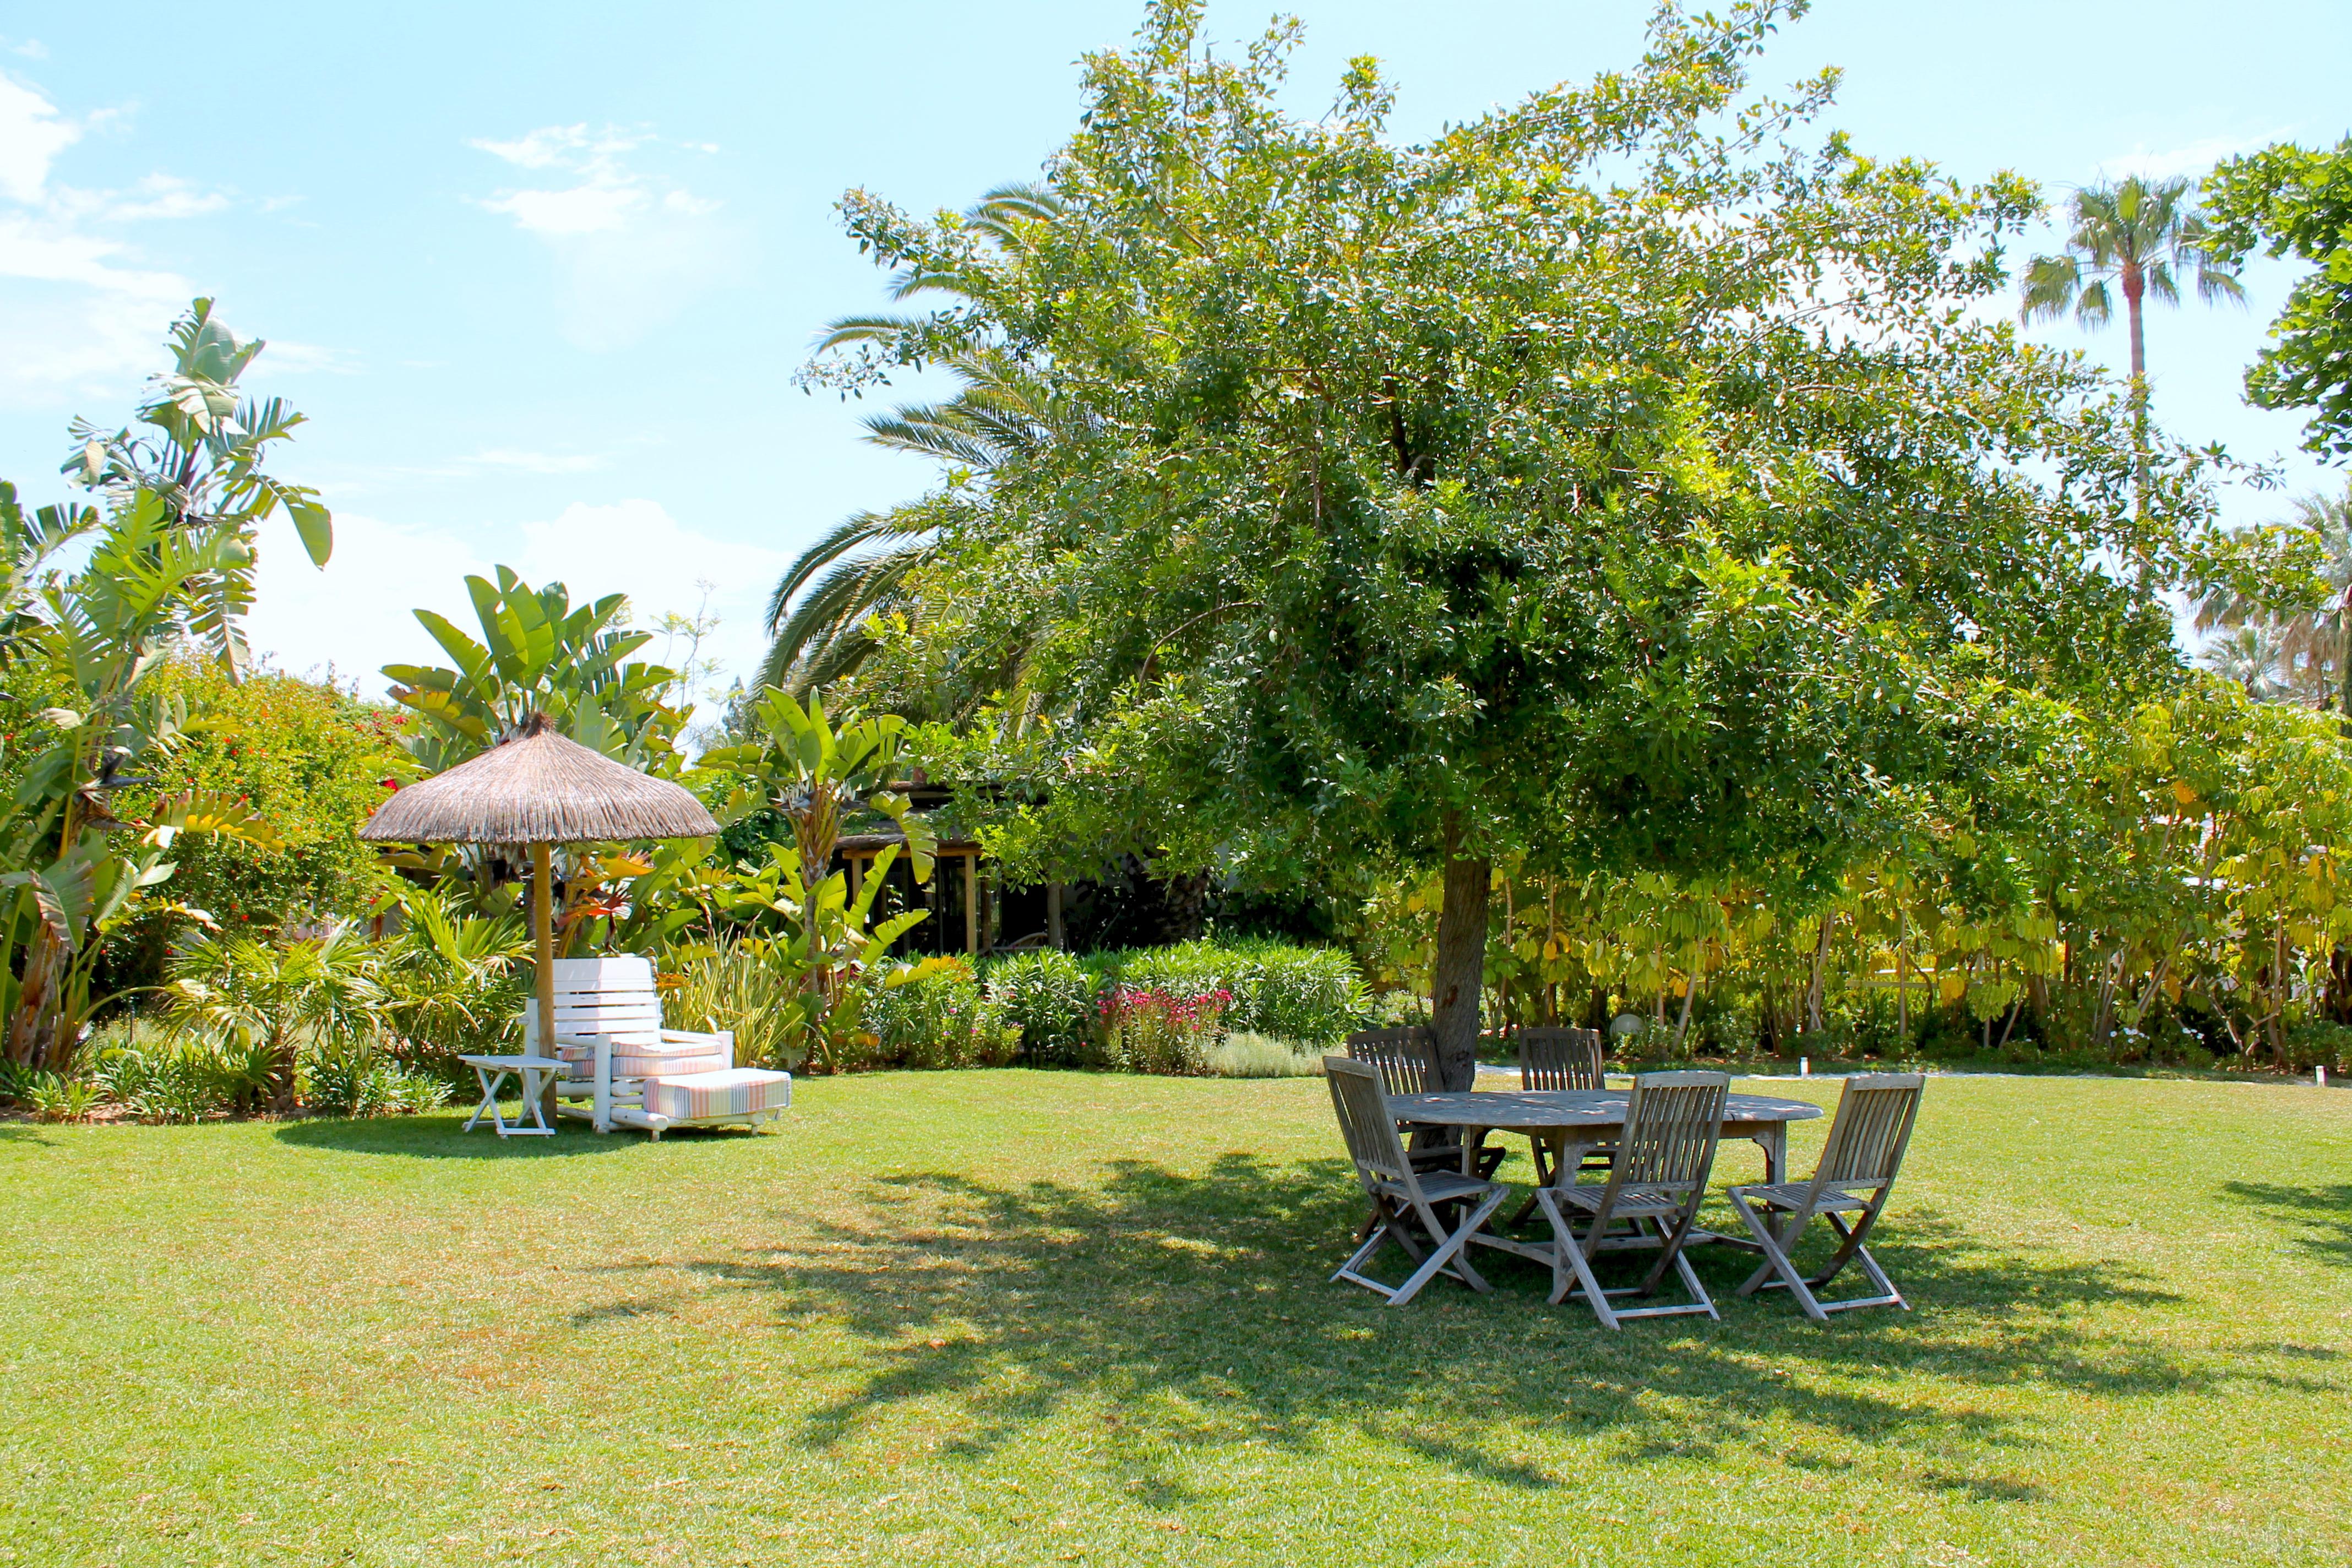 casalaconcha-garden-marbella-spain-lustforthesublime